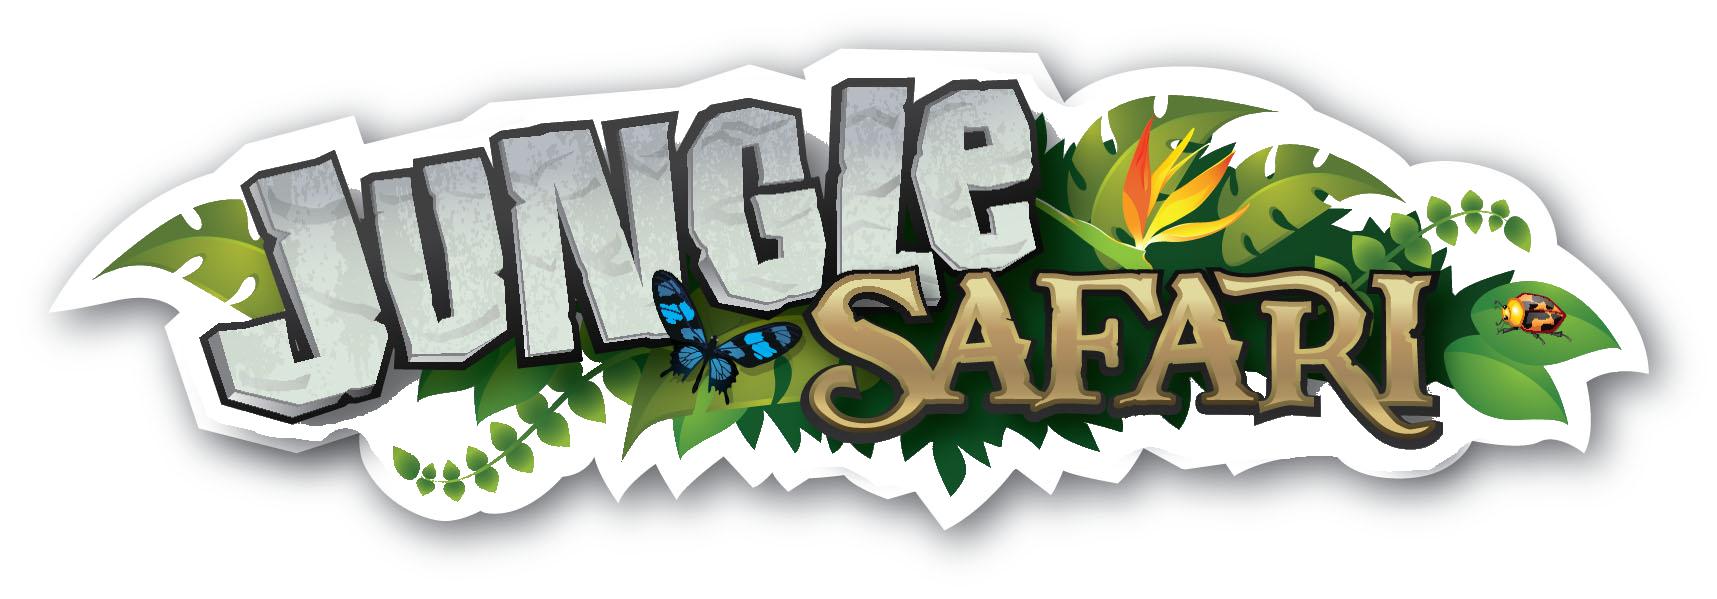 Jungle clipart flora and fauna. Sea stone travels safari